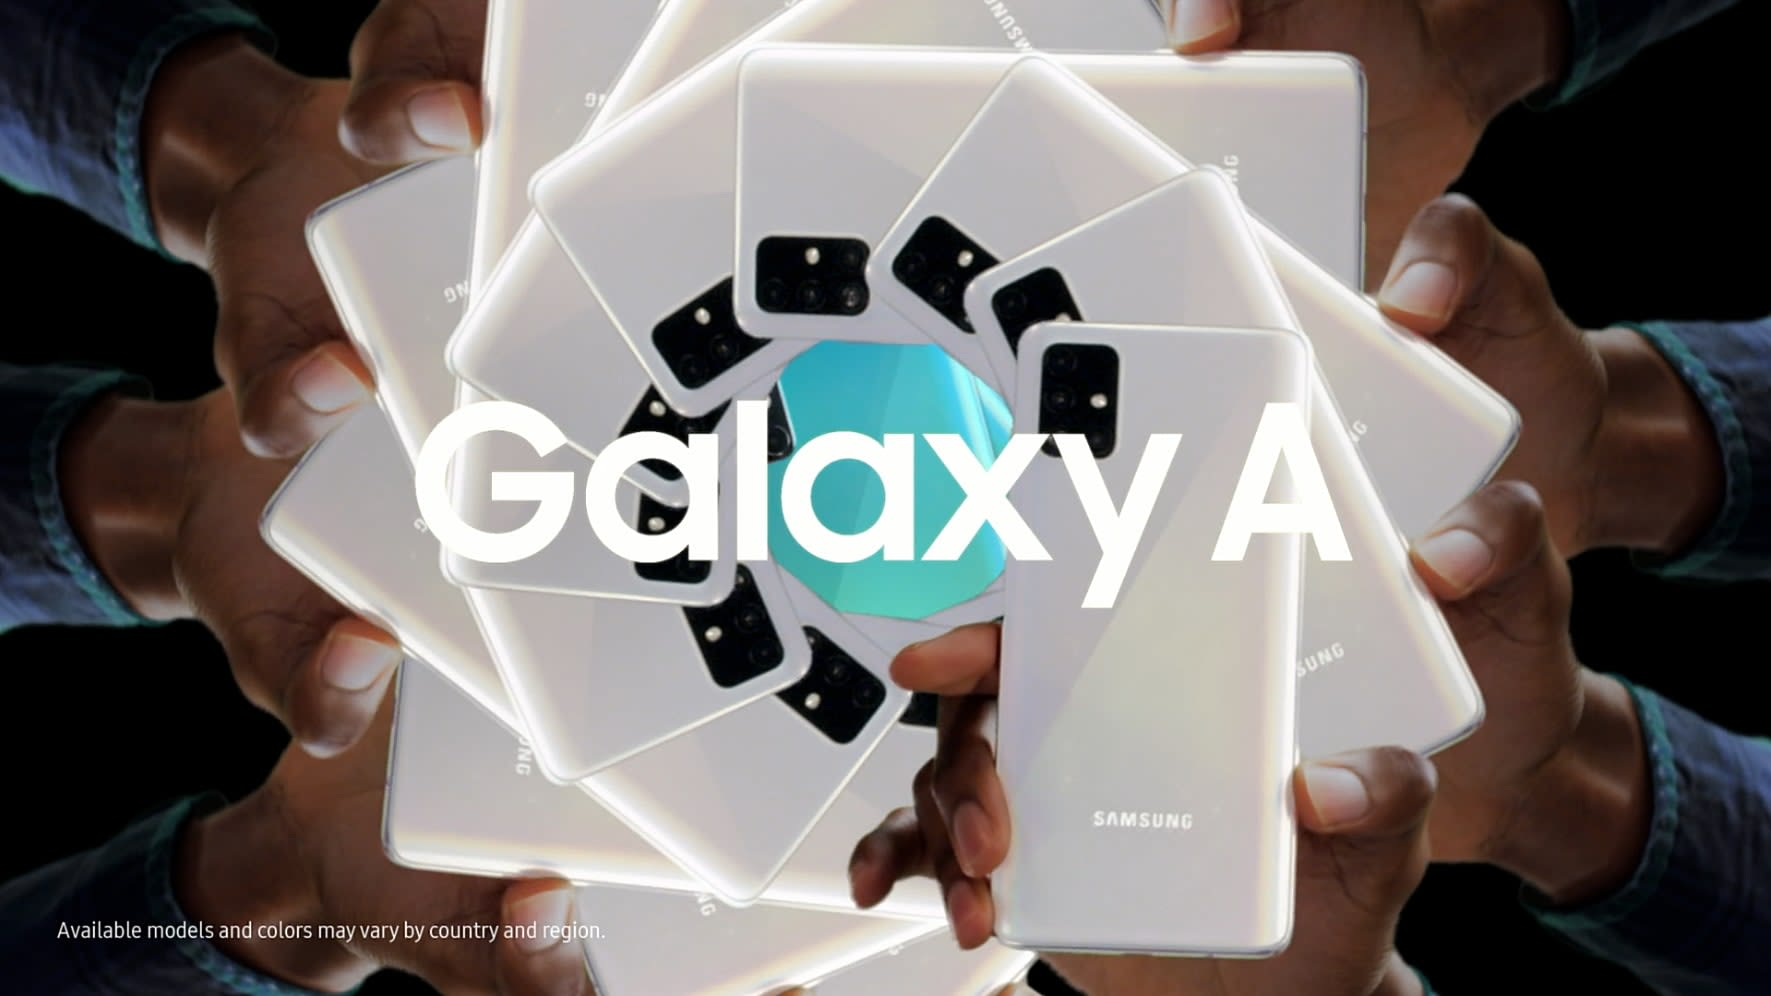 budget Samsung smartphones